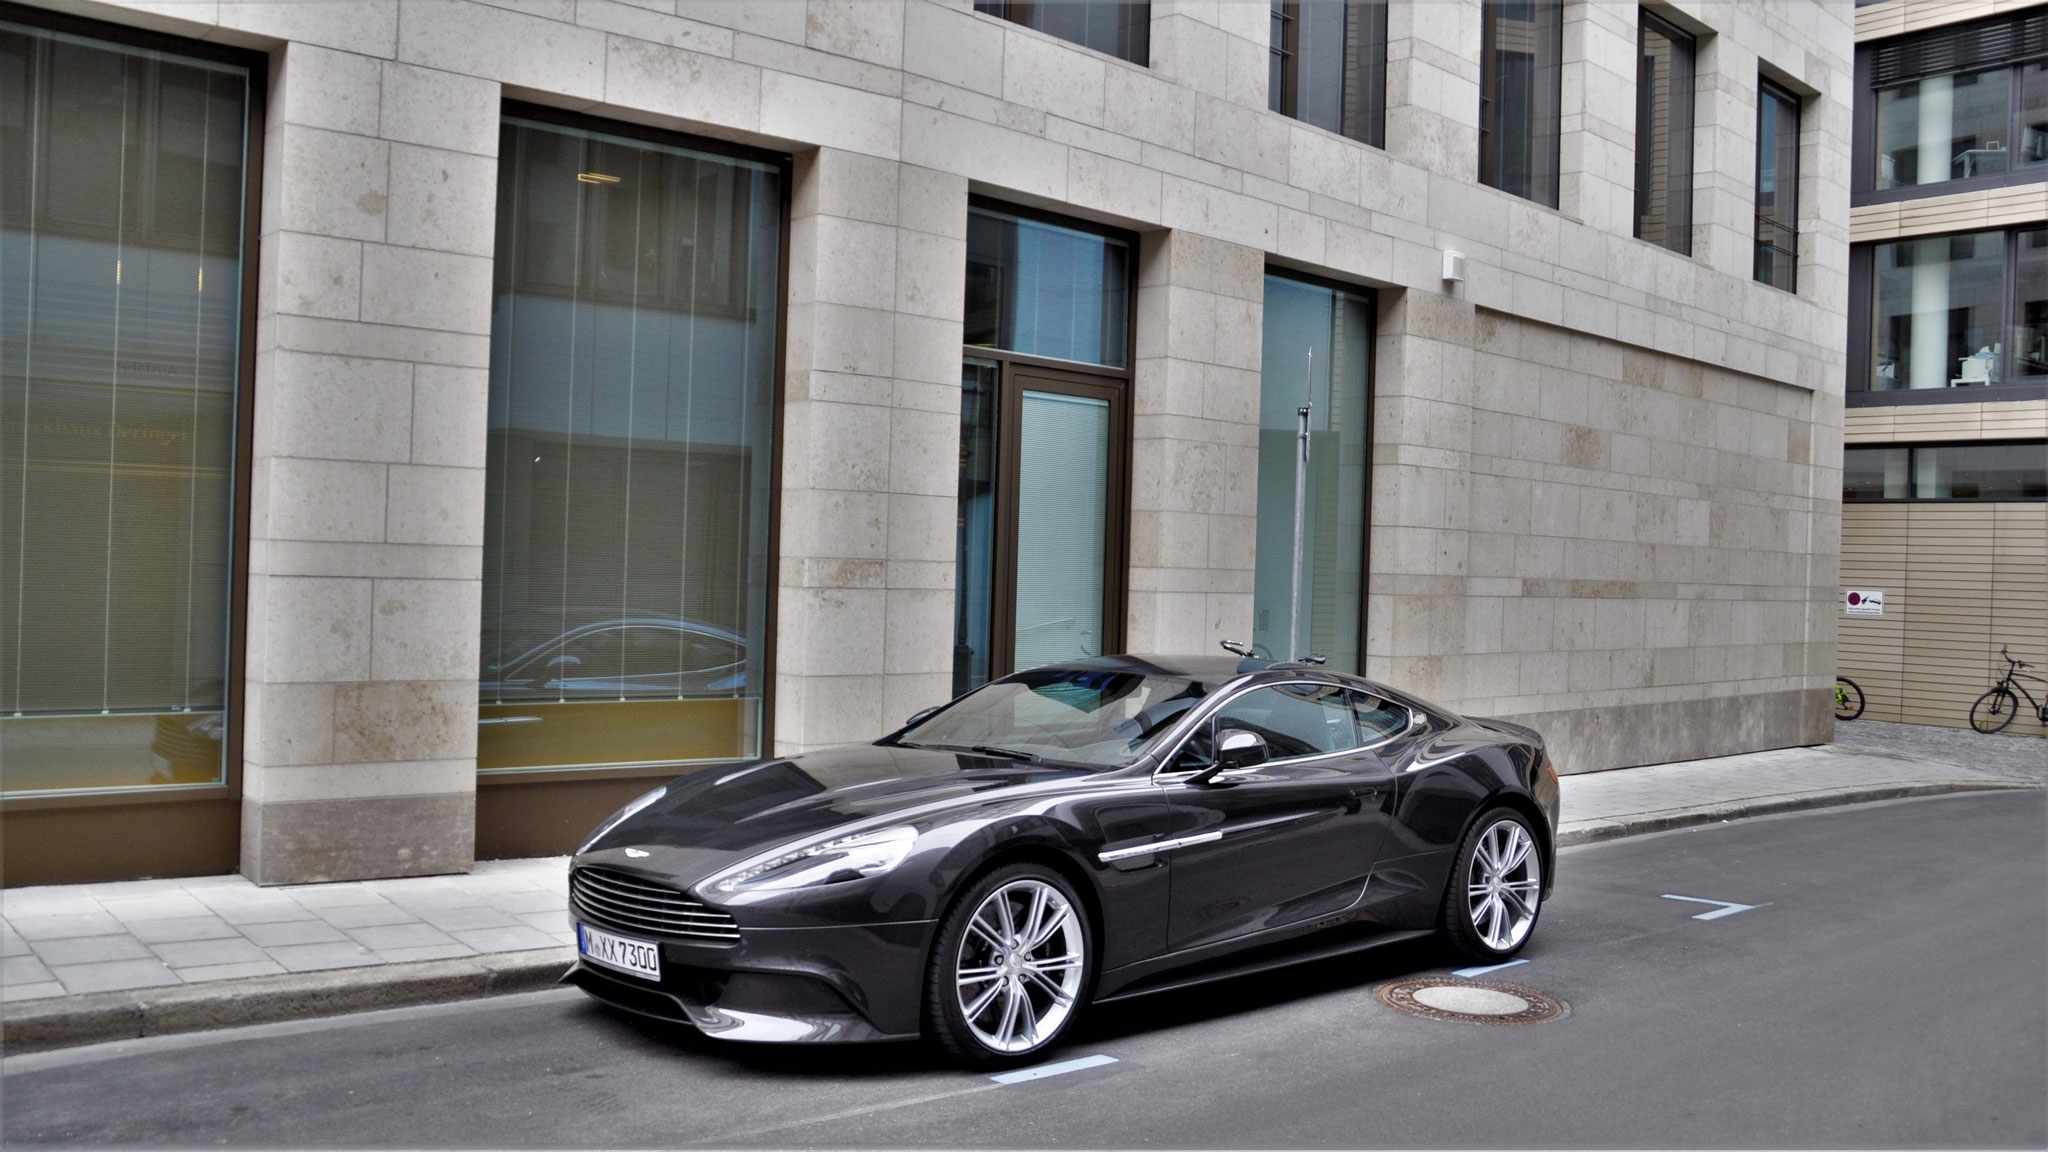 Aston Martin Vanquish - M-XX-7300